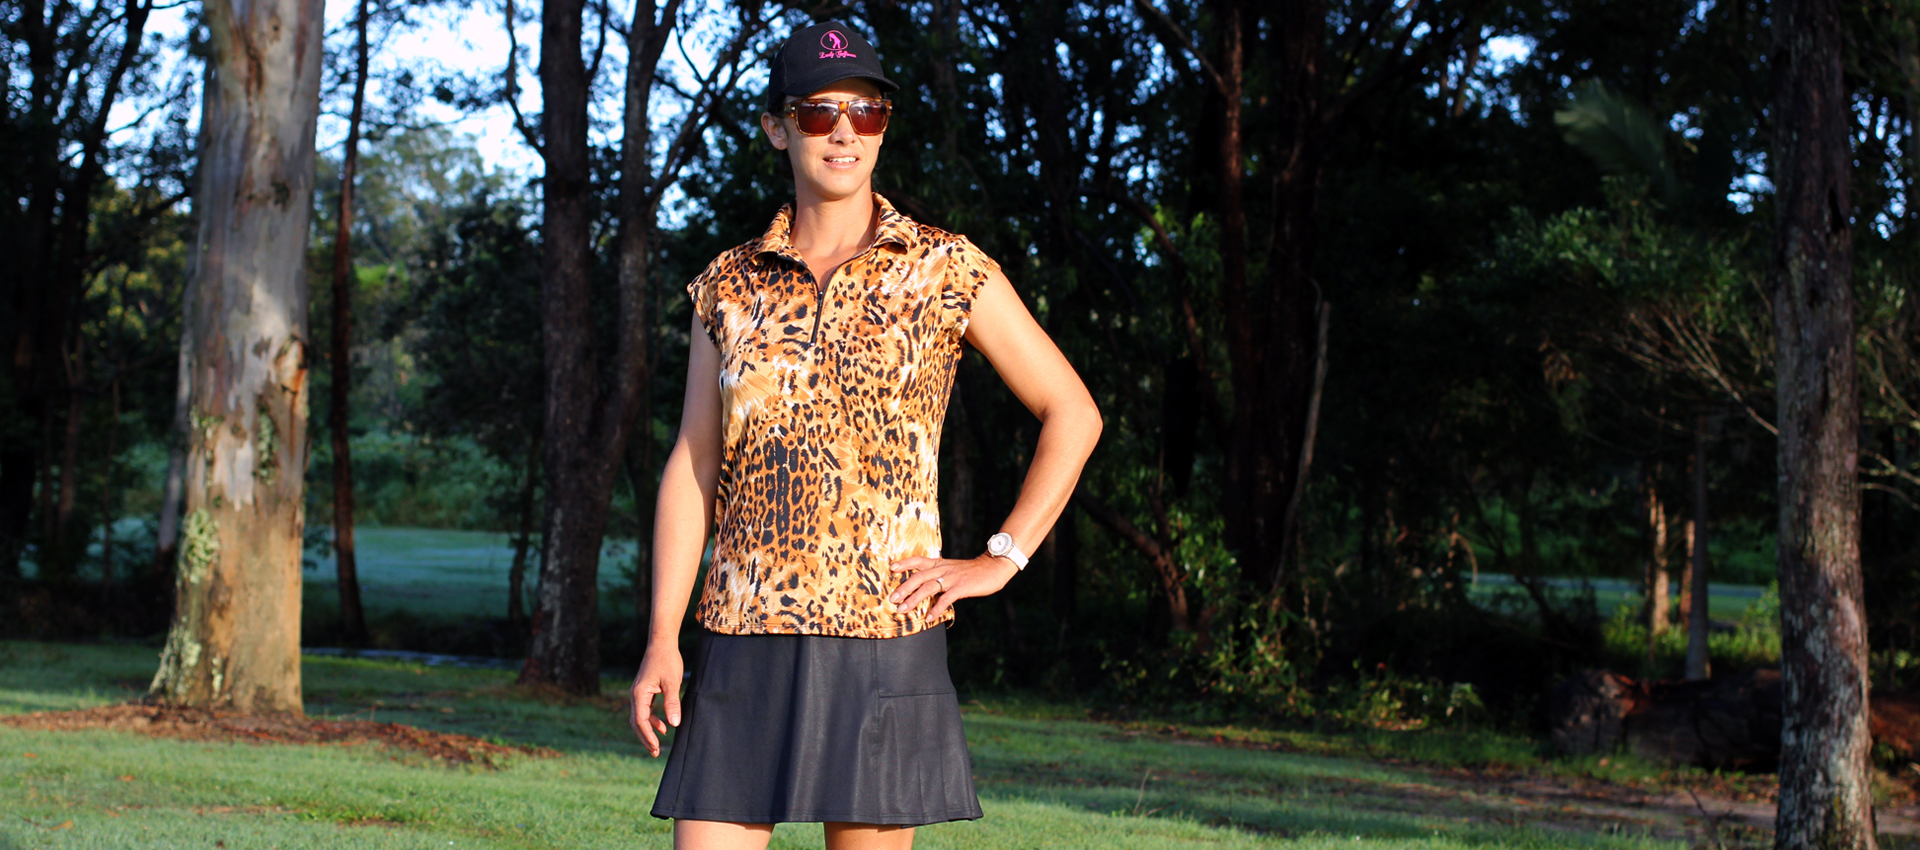 womens-golf-clothing-shirts-cap-sleeves-australian-made.jpg